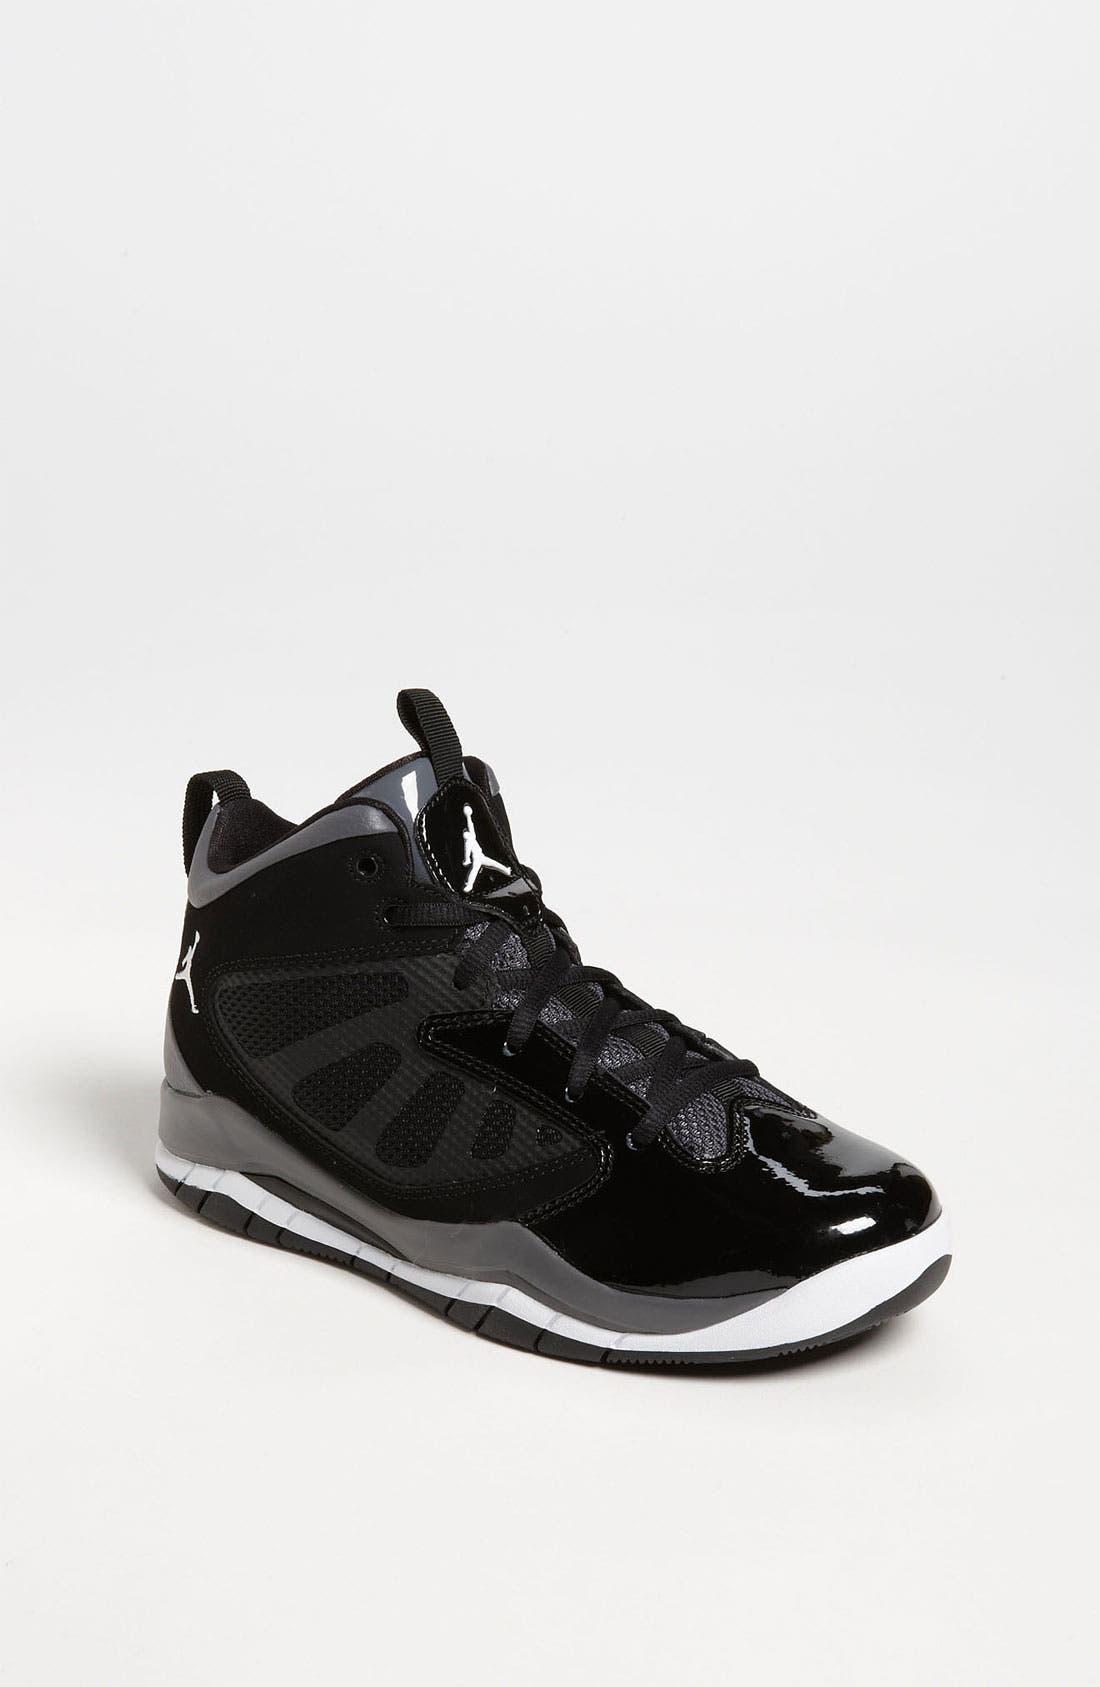 Alternate Image 1 Selected - Nike 'Jordan Flight Team 11' Basketball Shoe (Big Kid)